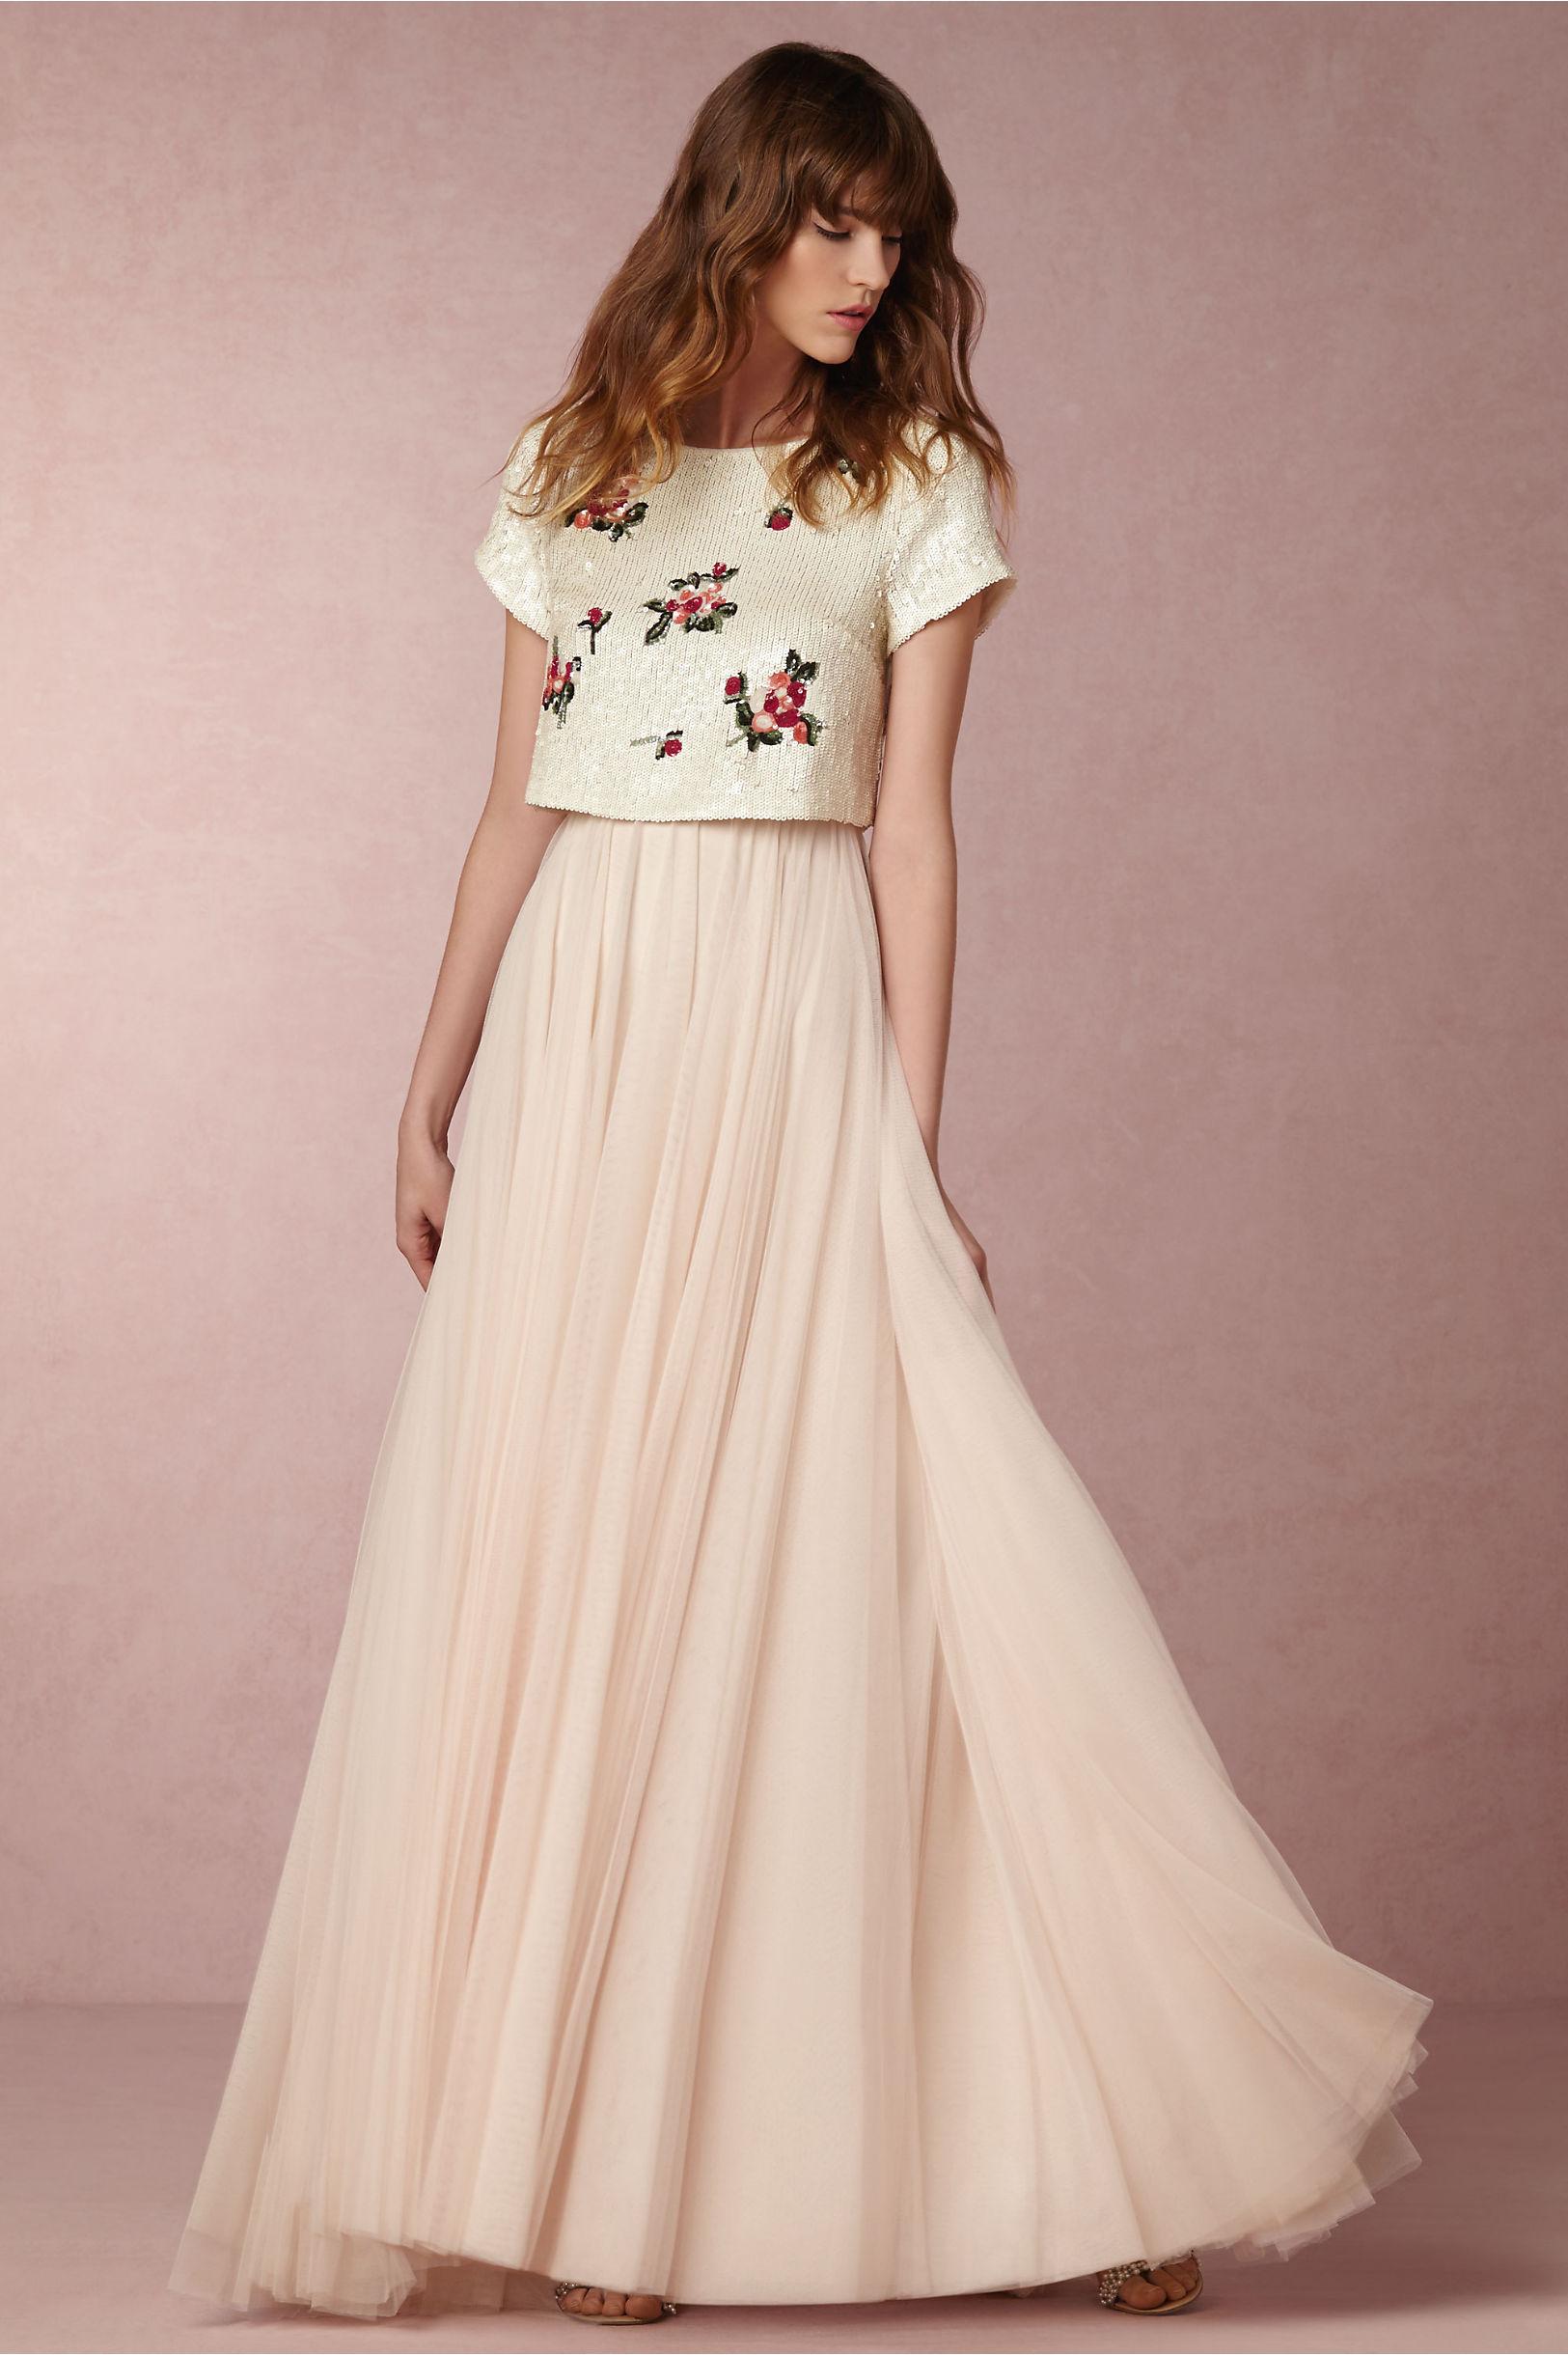 bride bridal separates wedding dress skirt Tulley Top Amora Skirt